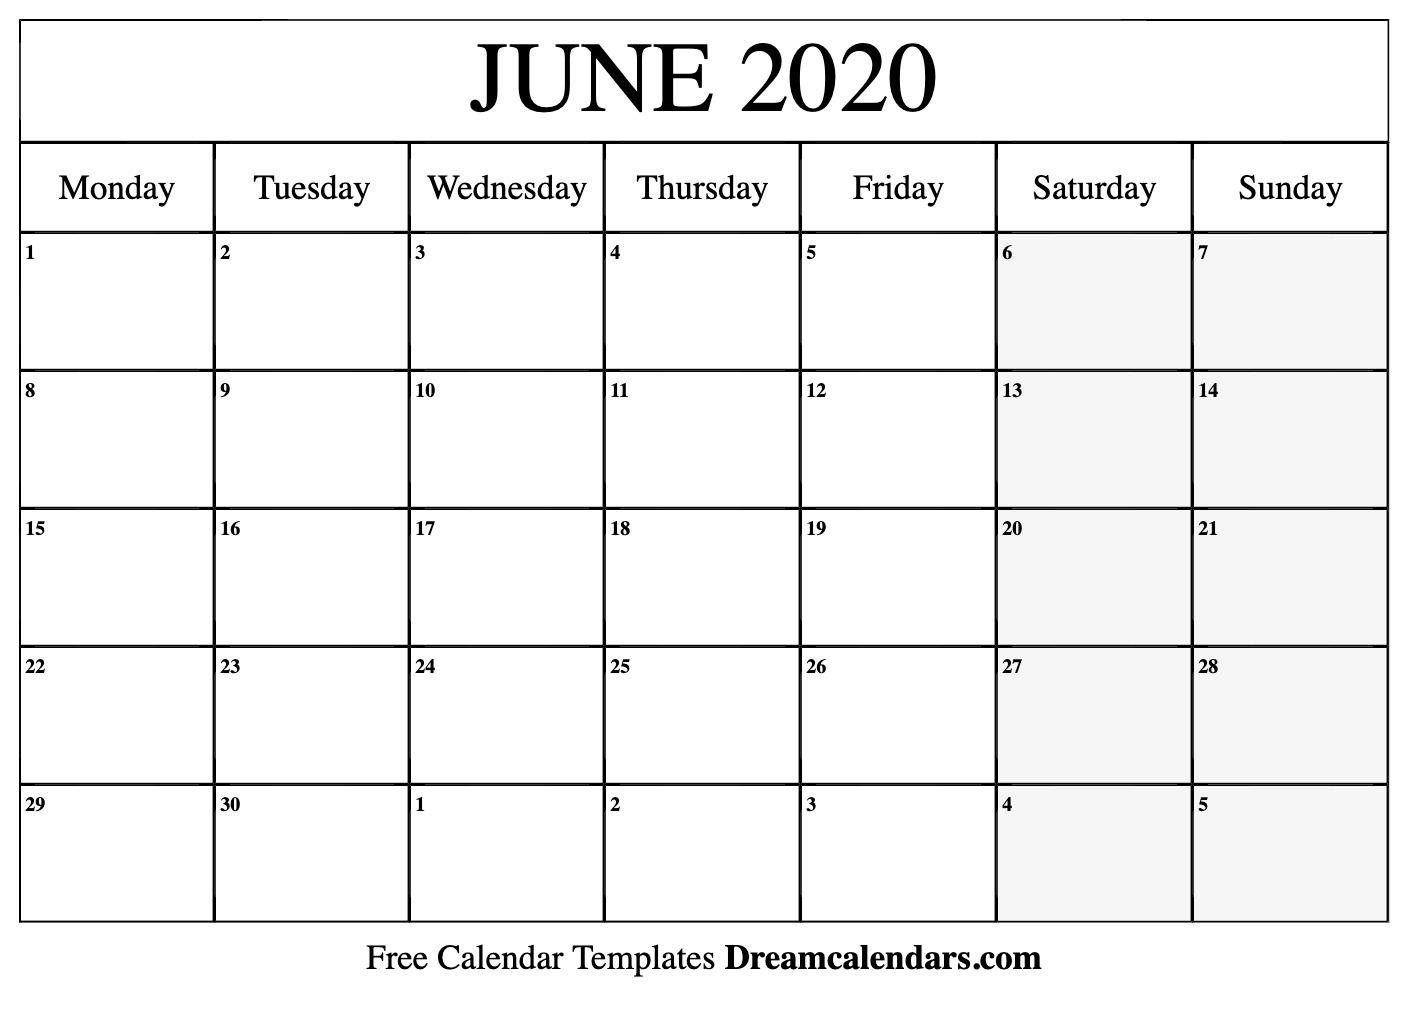 Printable June 2020 Calendar intended for Monday To Sunday Printable 2020 Calendar